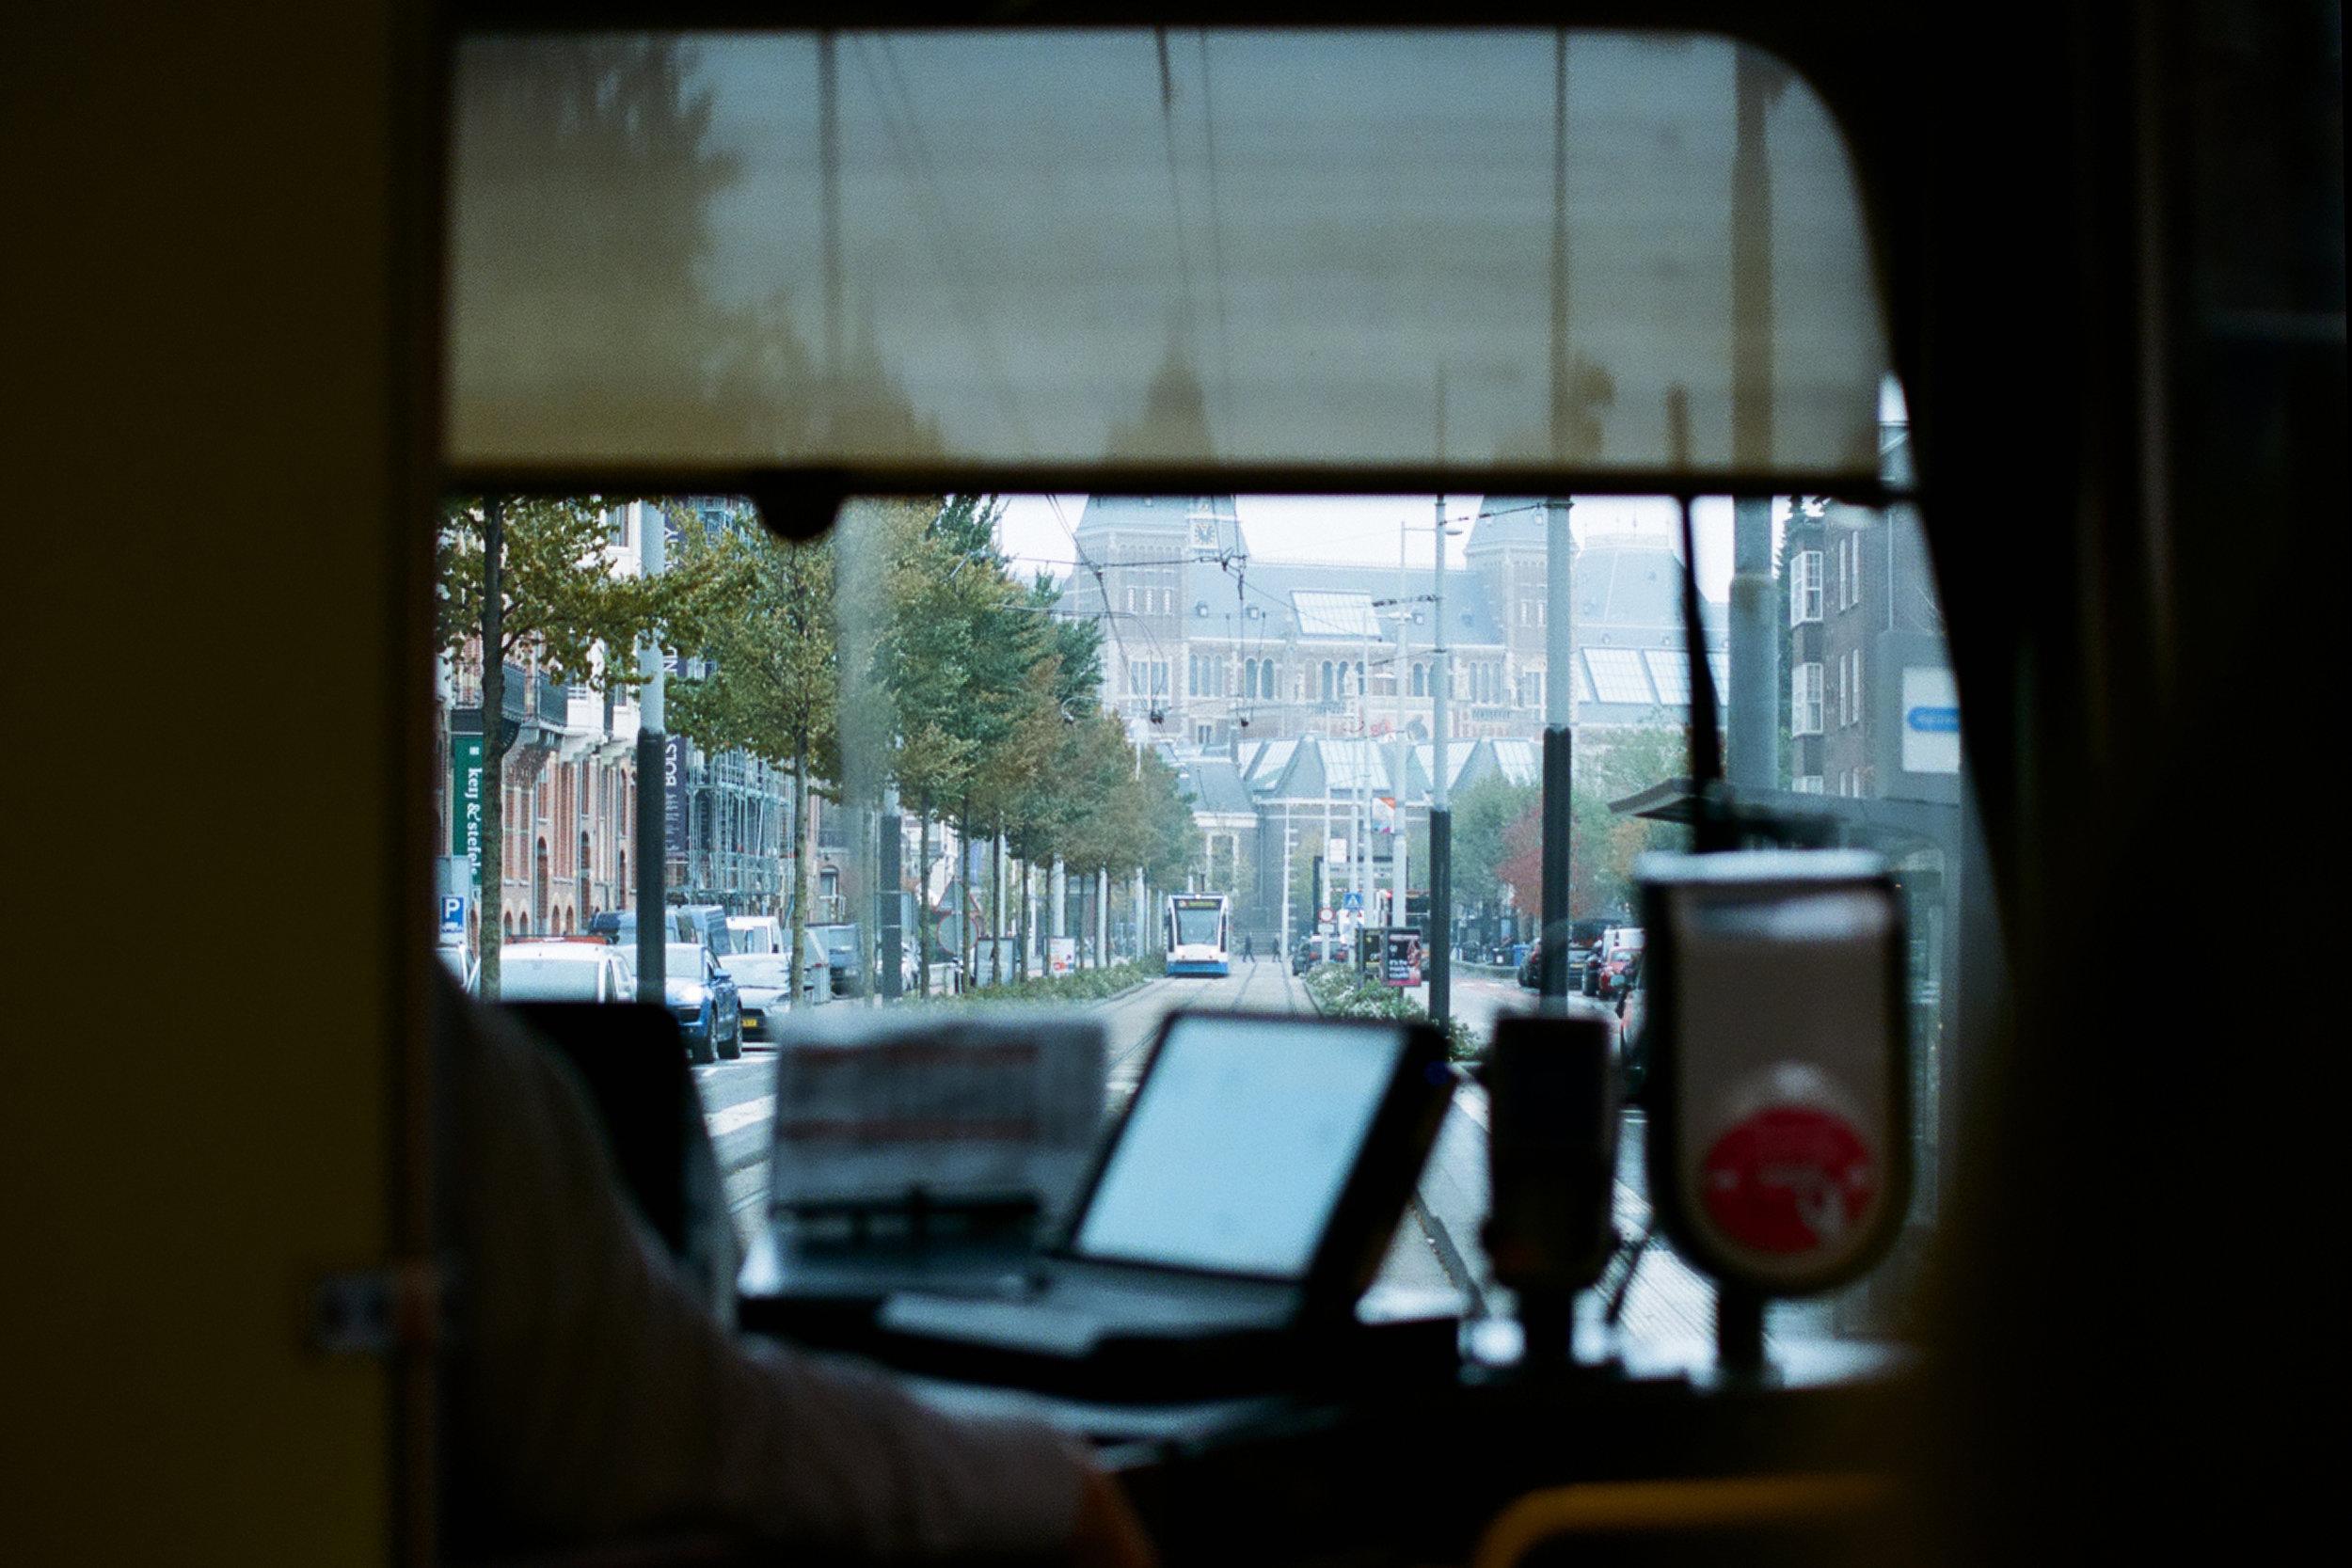 Amsterdam_0076 copy.jpg